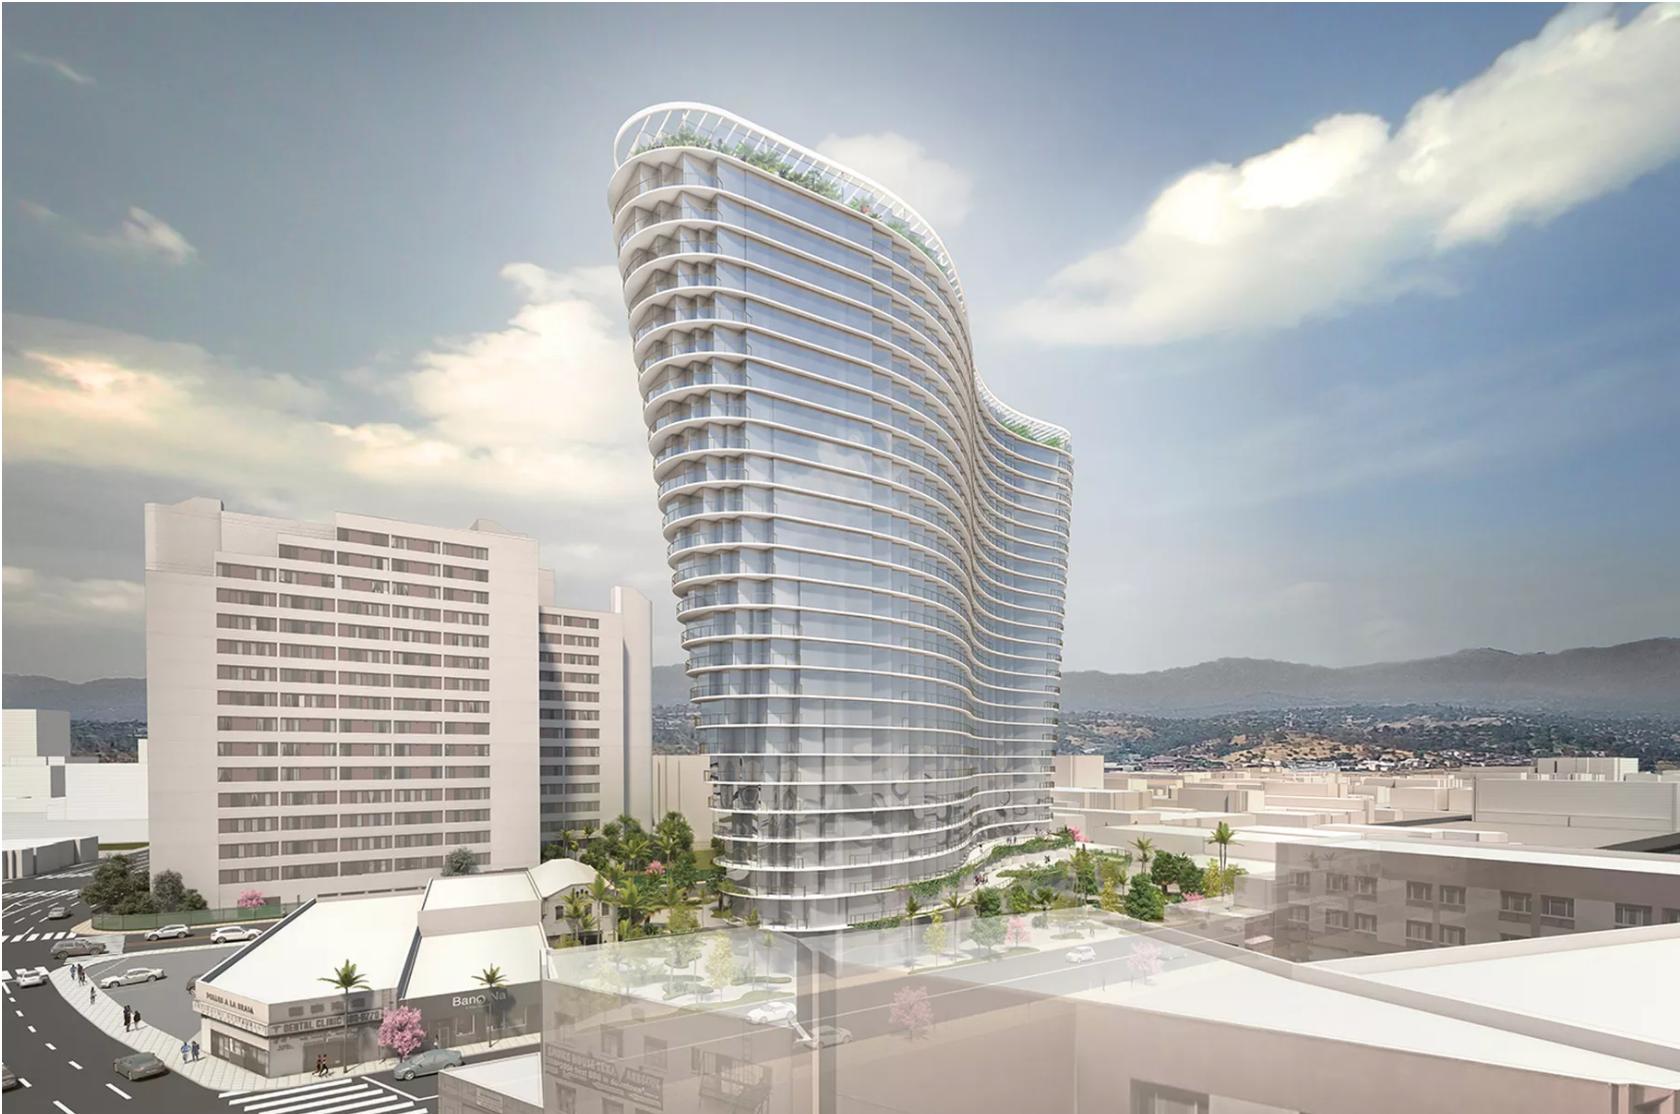 Los Angeles Real Estate